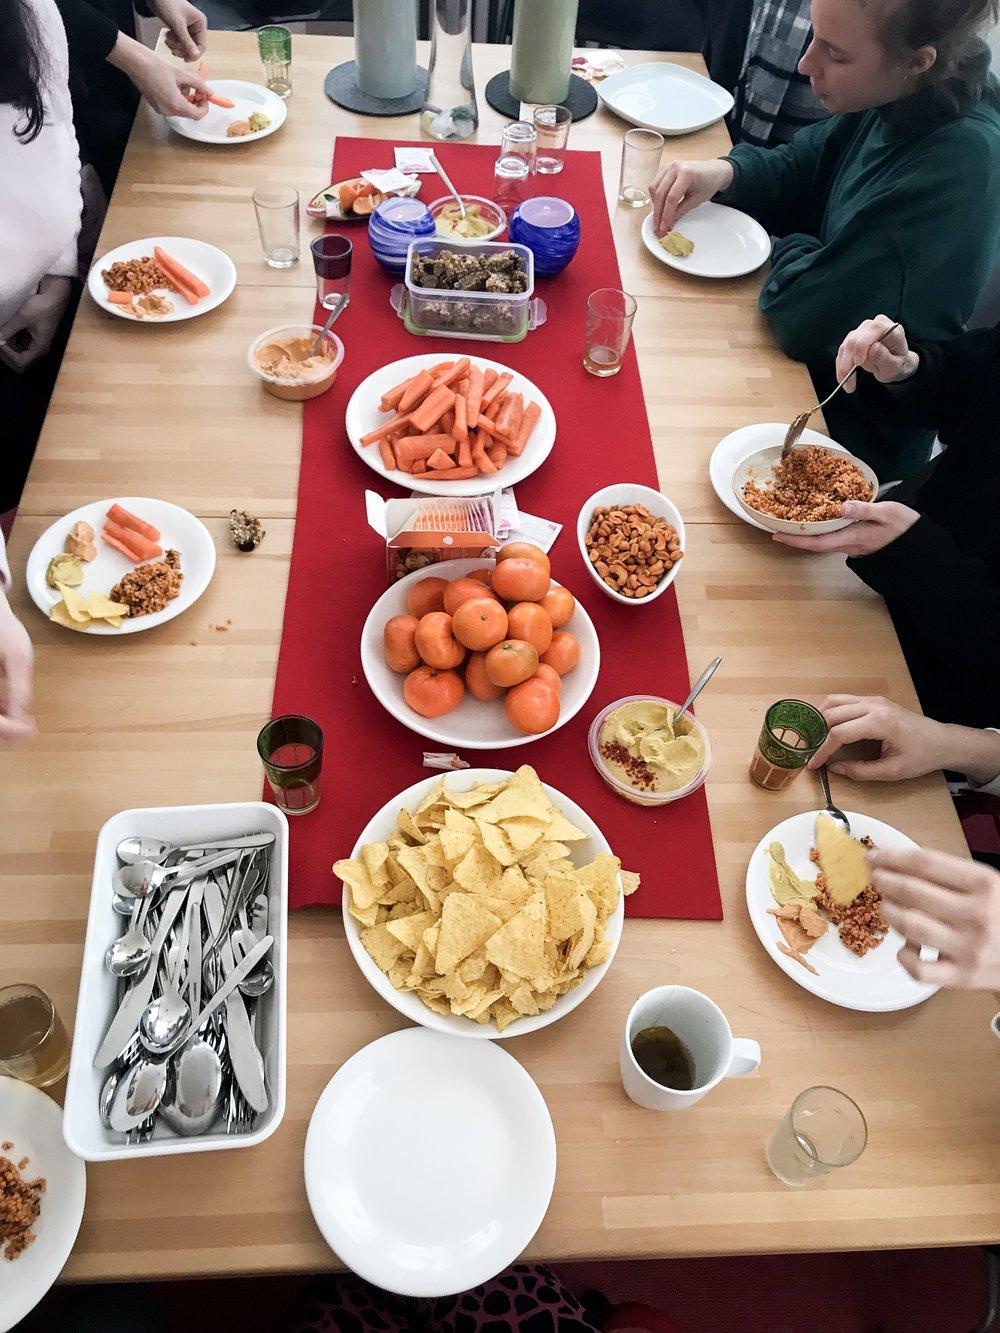 Sacral chakra snacks at the workshop (everything orange).